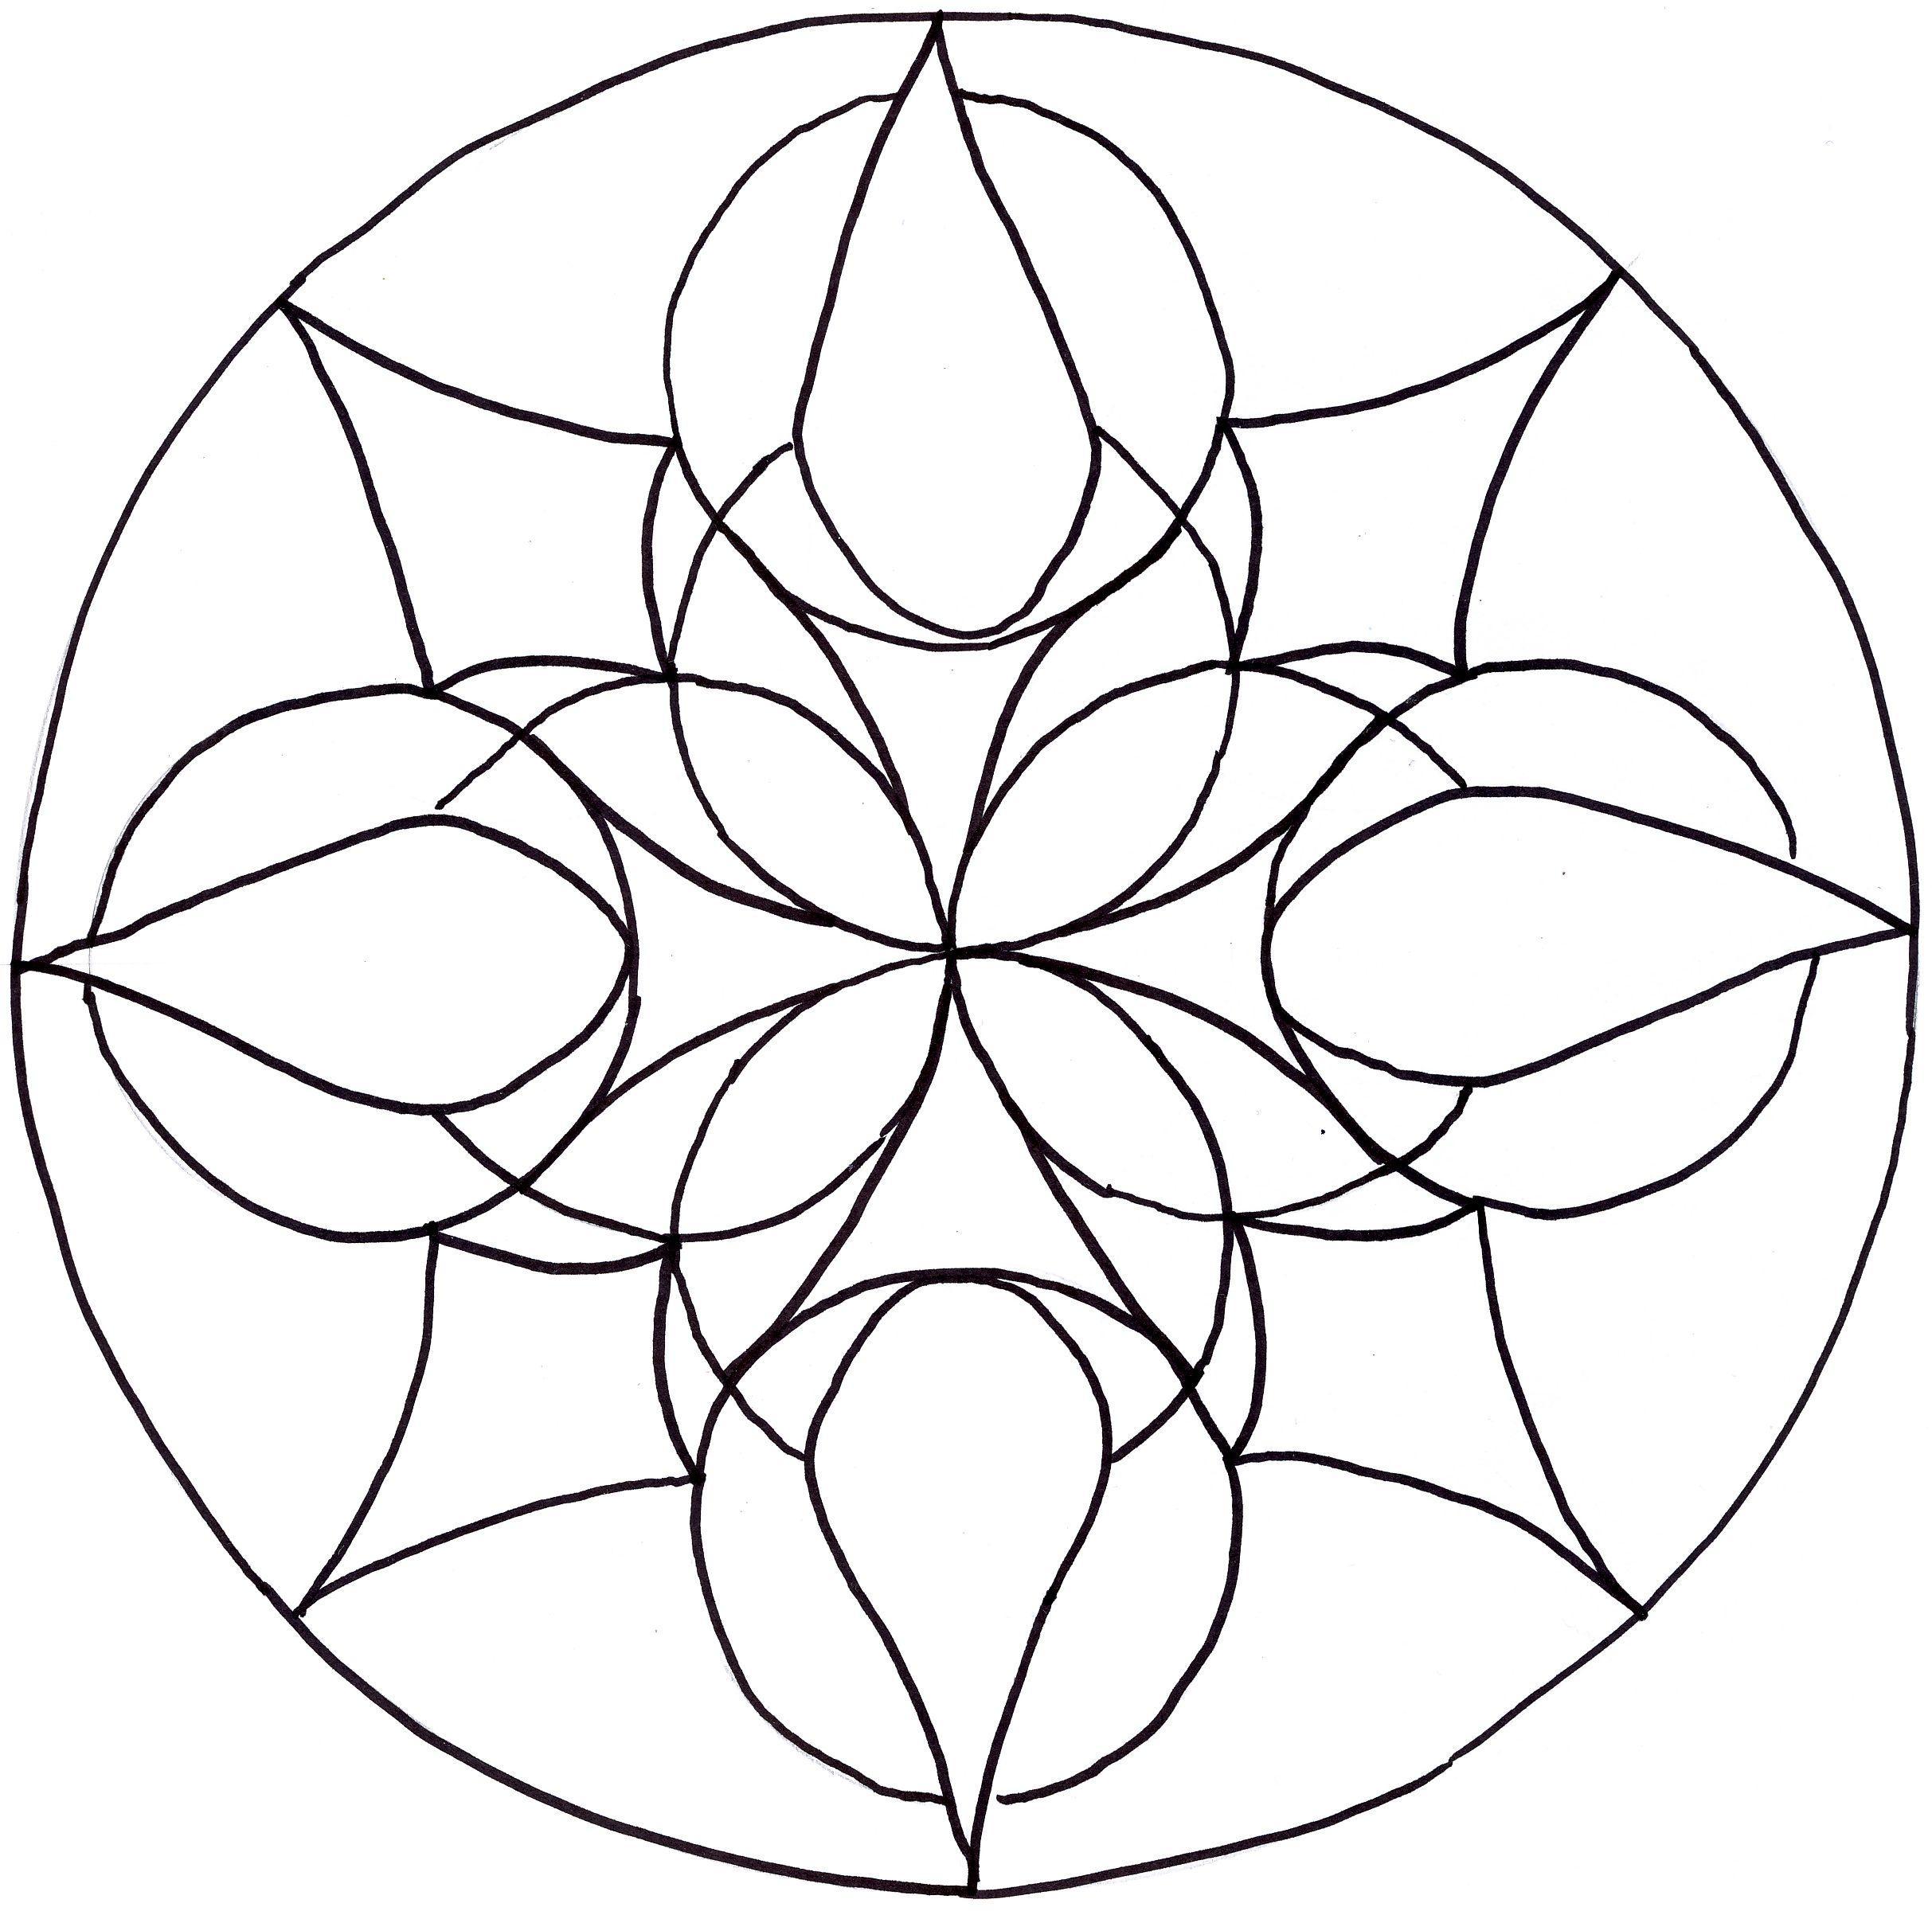 2426x2405 Mandalas For Children Centrum Mandala